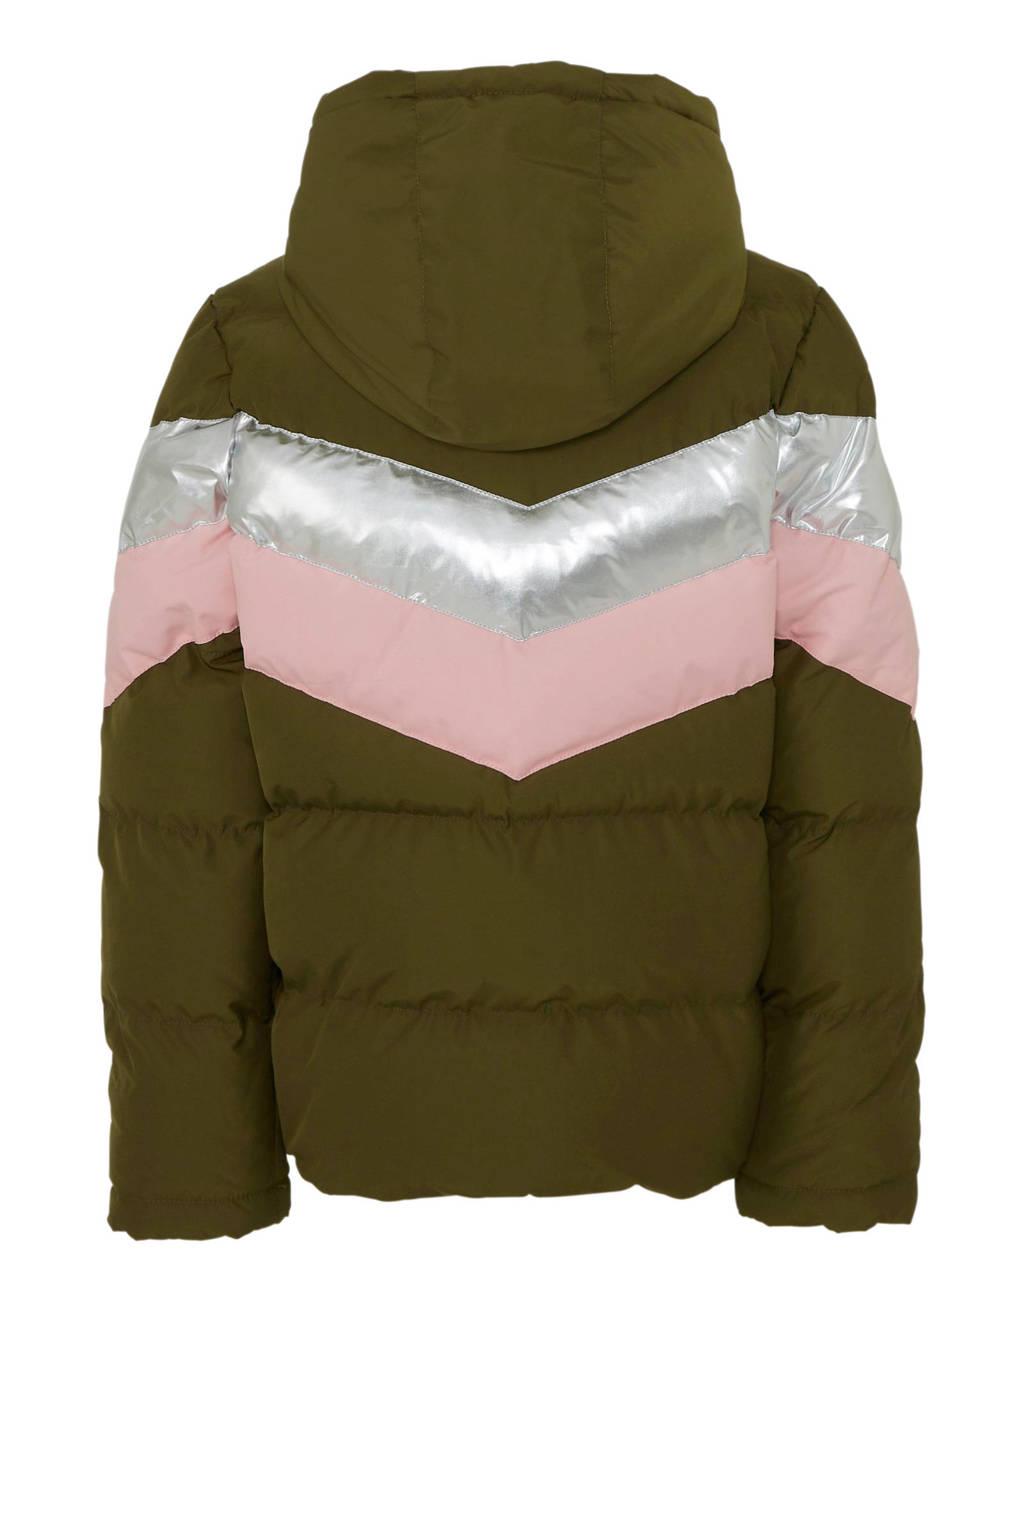 Cars winterjas Sarina donkergroen, Army groen/roze/zilver